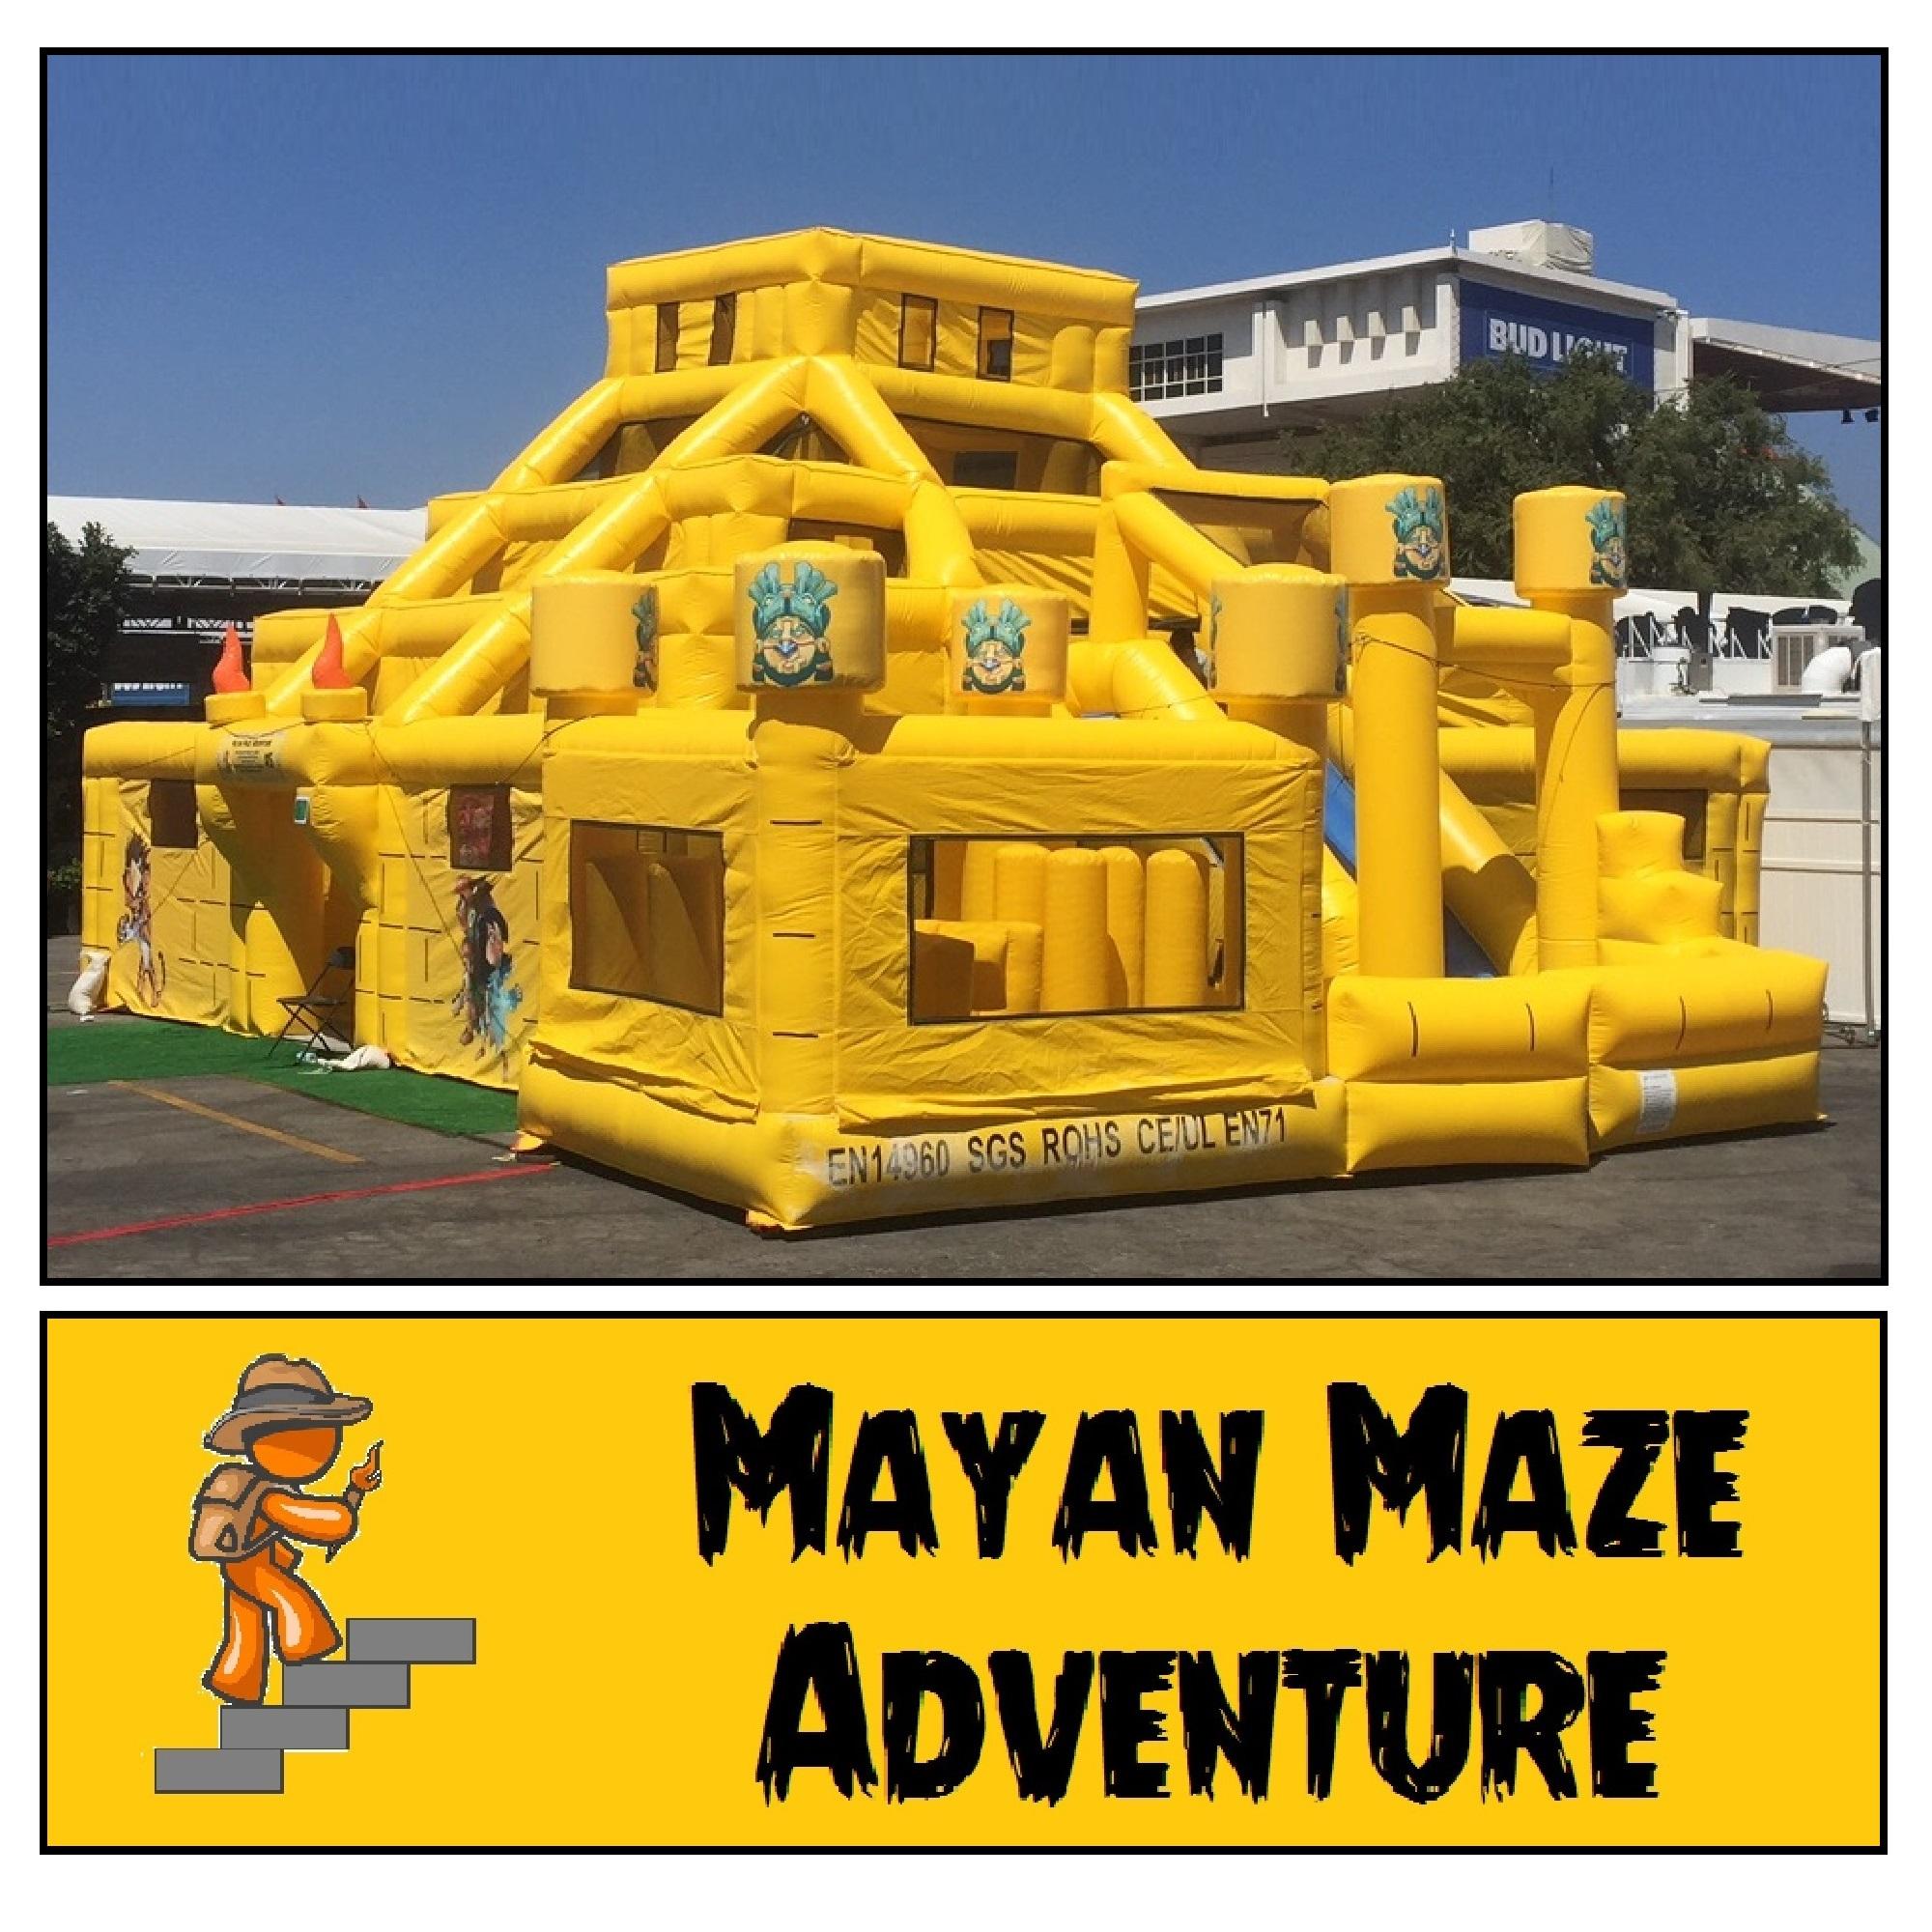 Mayan Maze Adventure